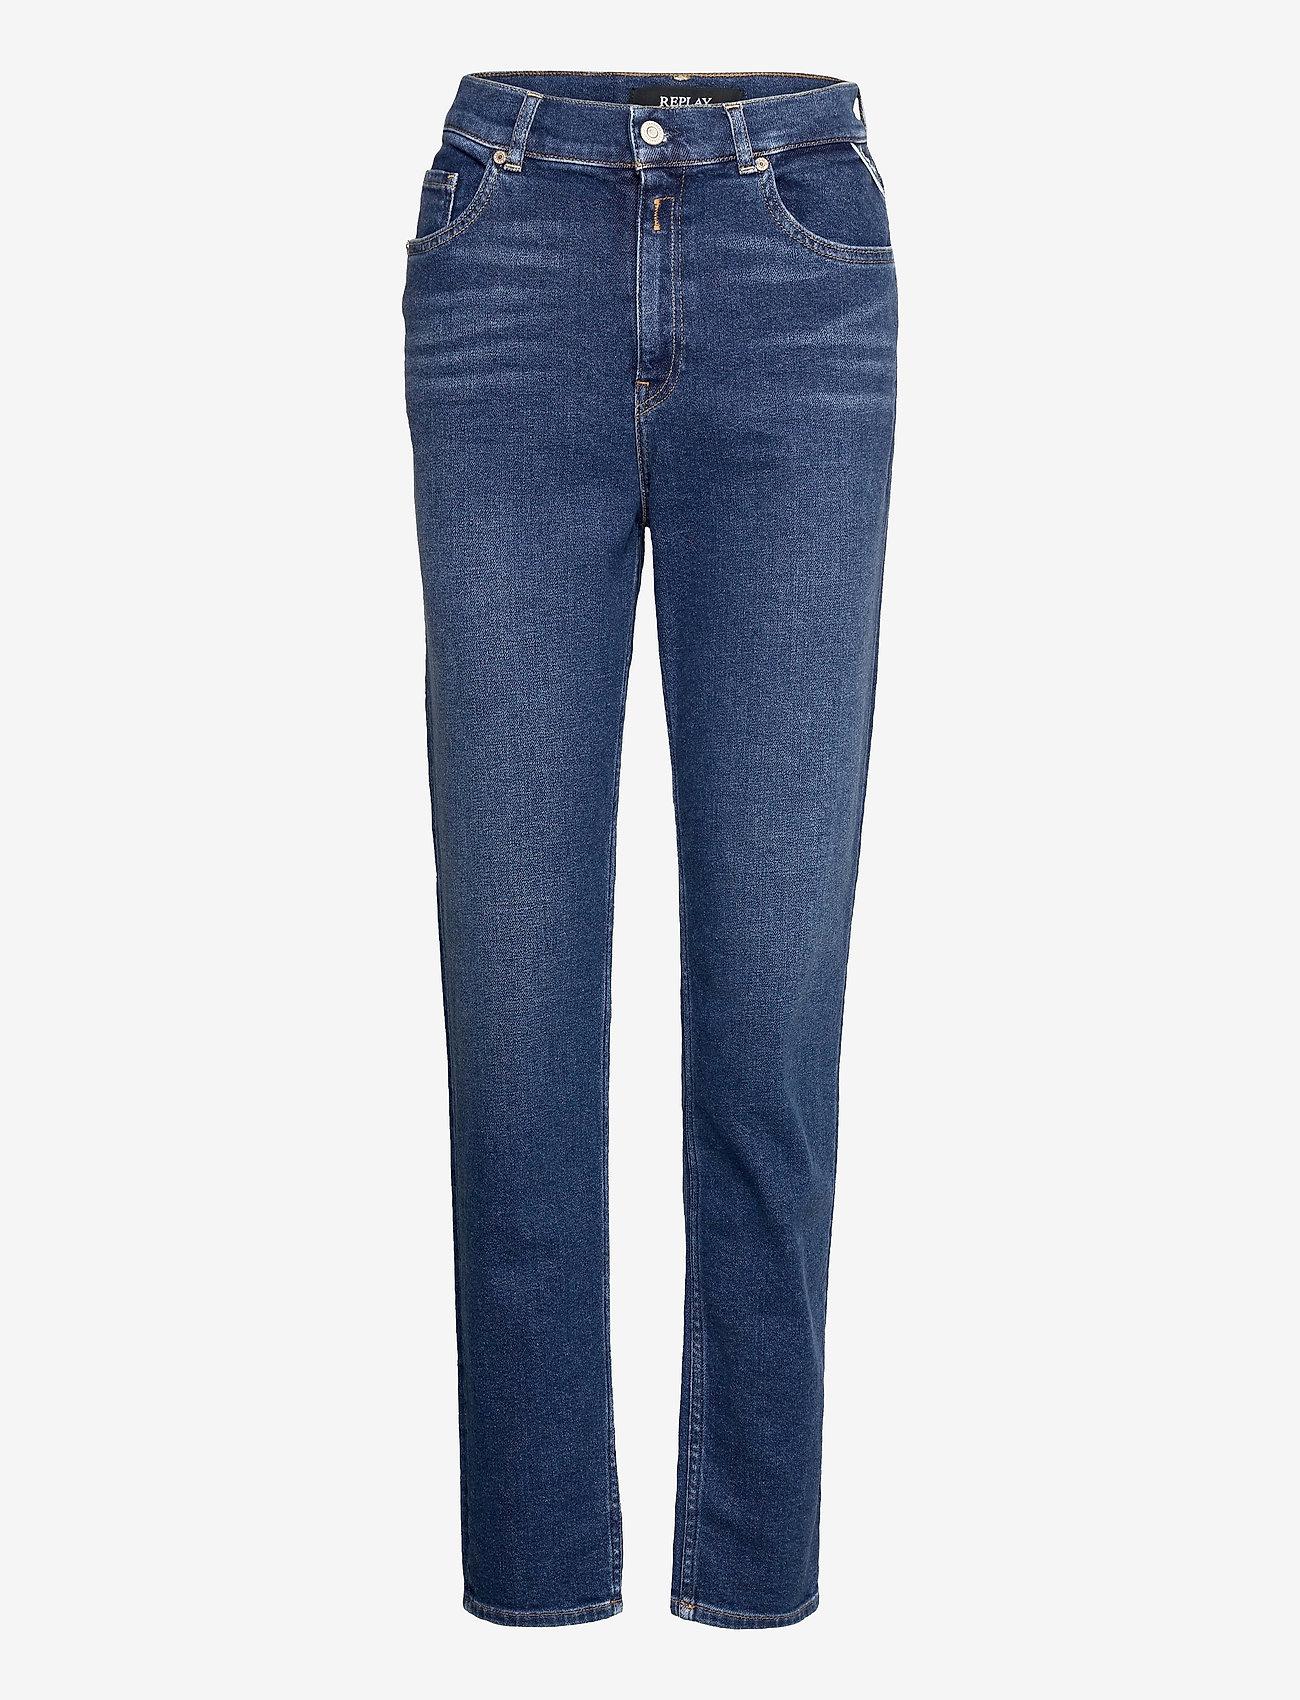 Replay - KILEY Rose Label Pack - slim jeans - medium blue - 0